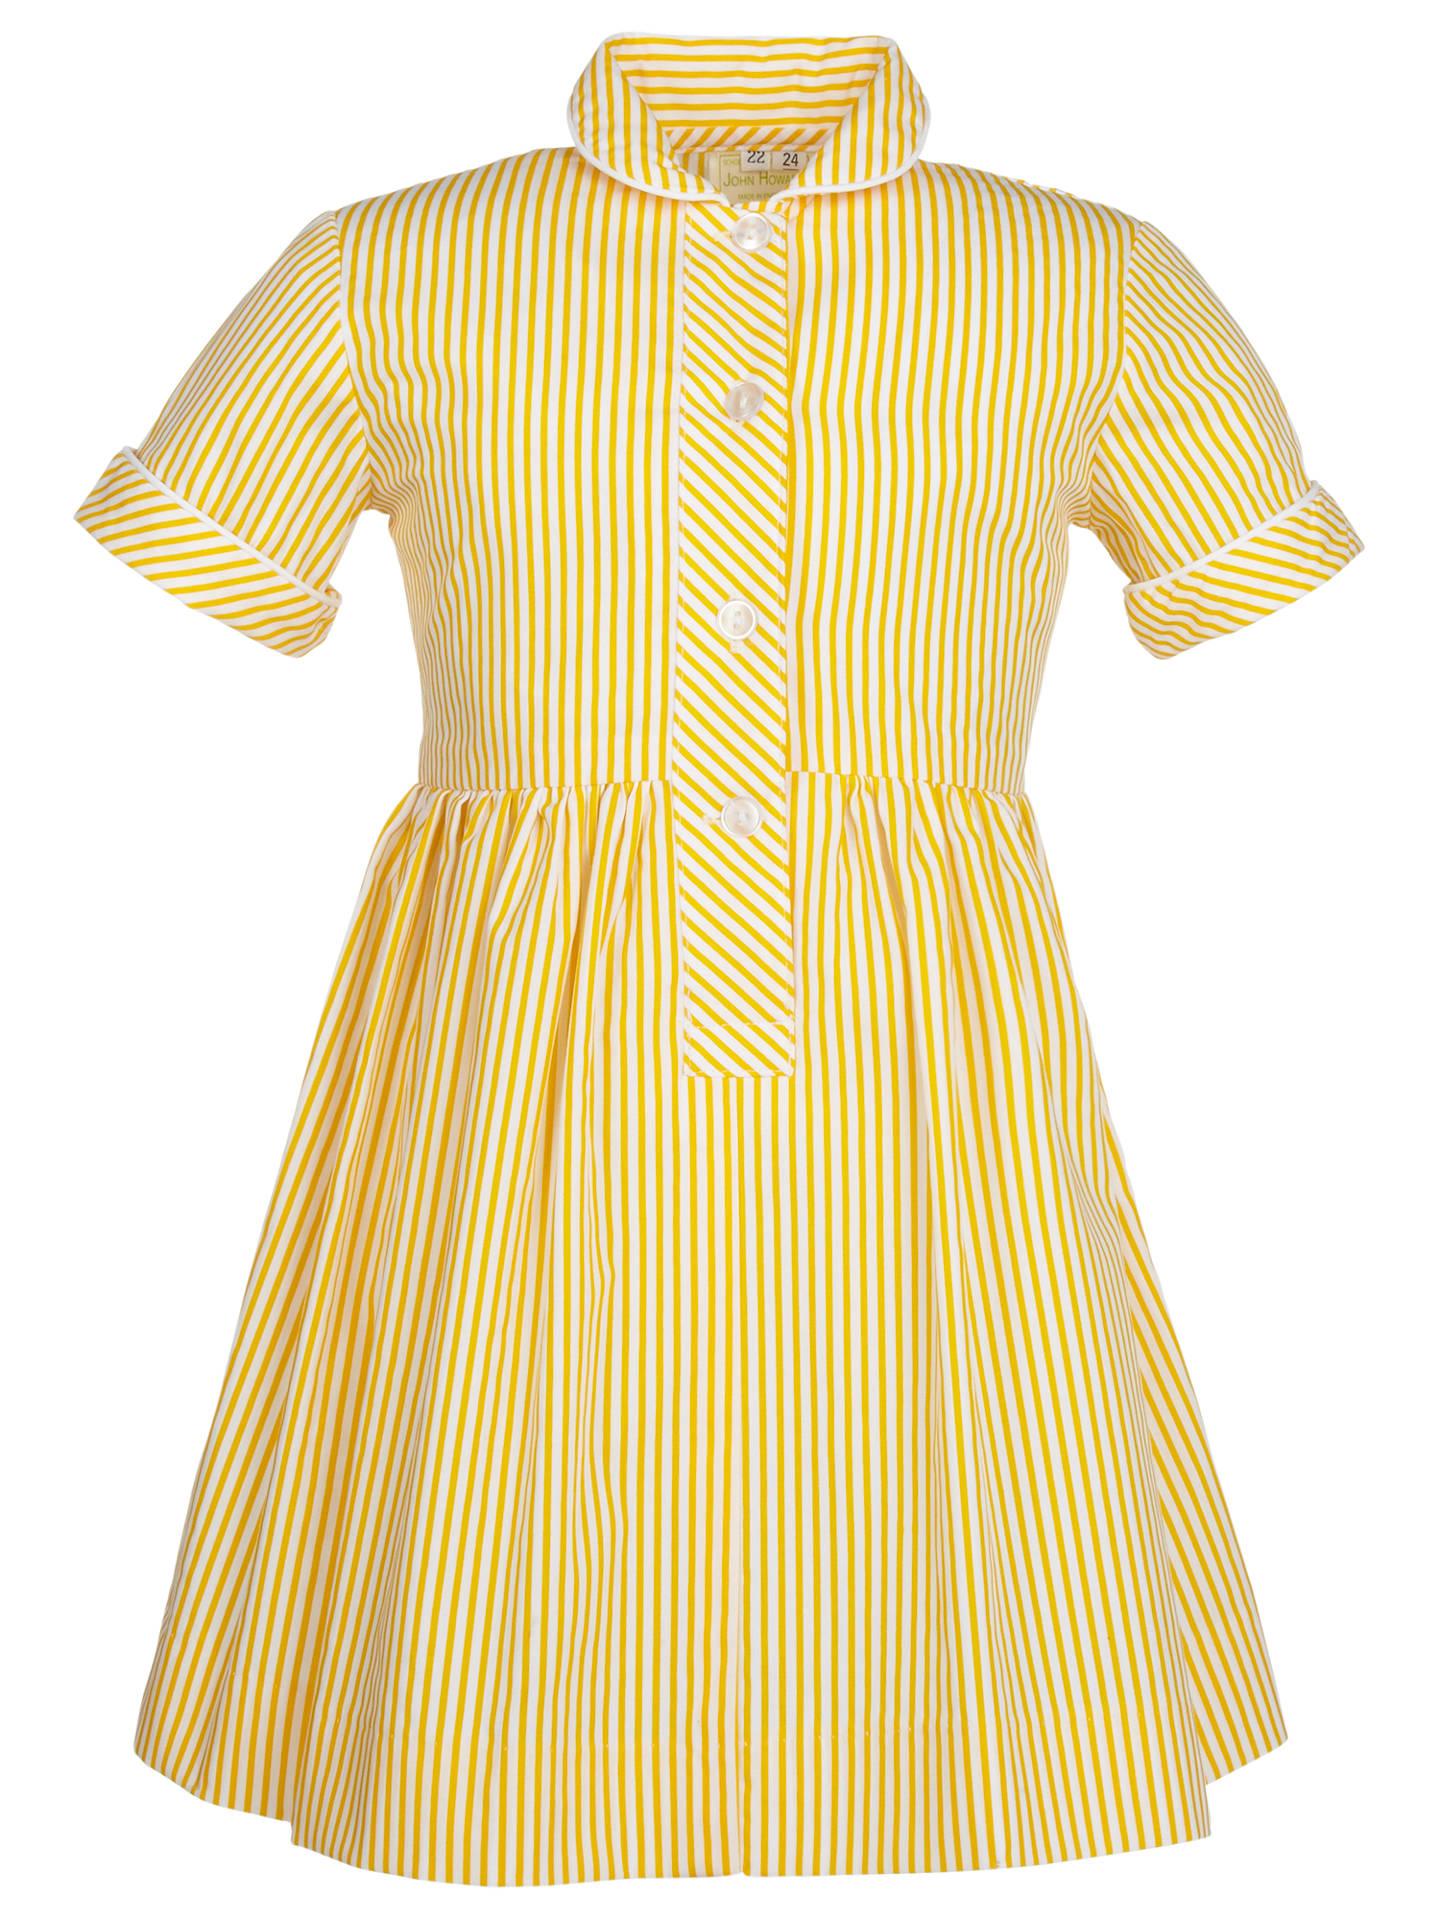 26b0efce82d9f School Girls' Summer Dress, Yellow at John Lewis & Partners